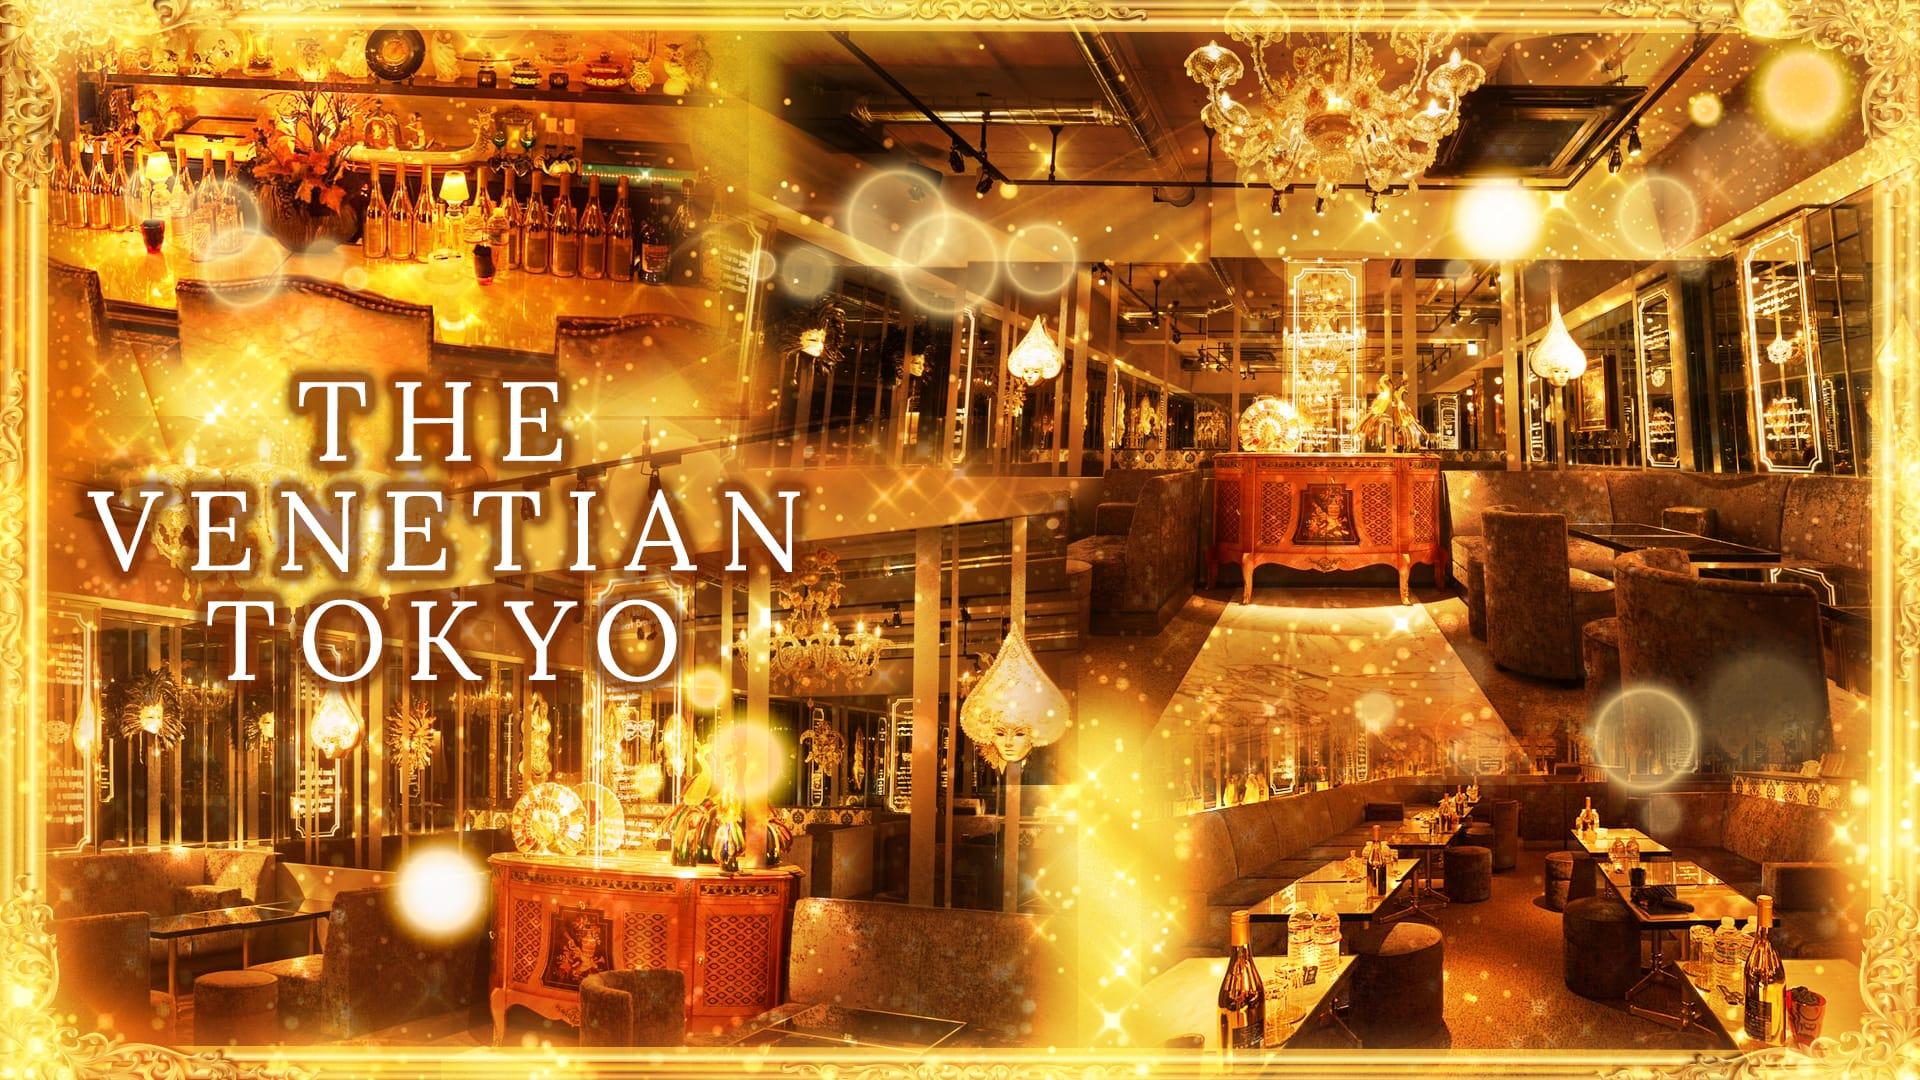 THE VENETIAN TOKYO(ヴェネチアン トウキョウ) 六本木 六本木キャバクラ TOP画像